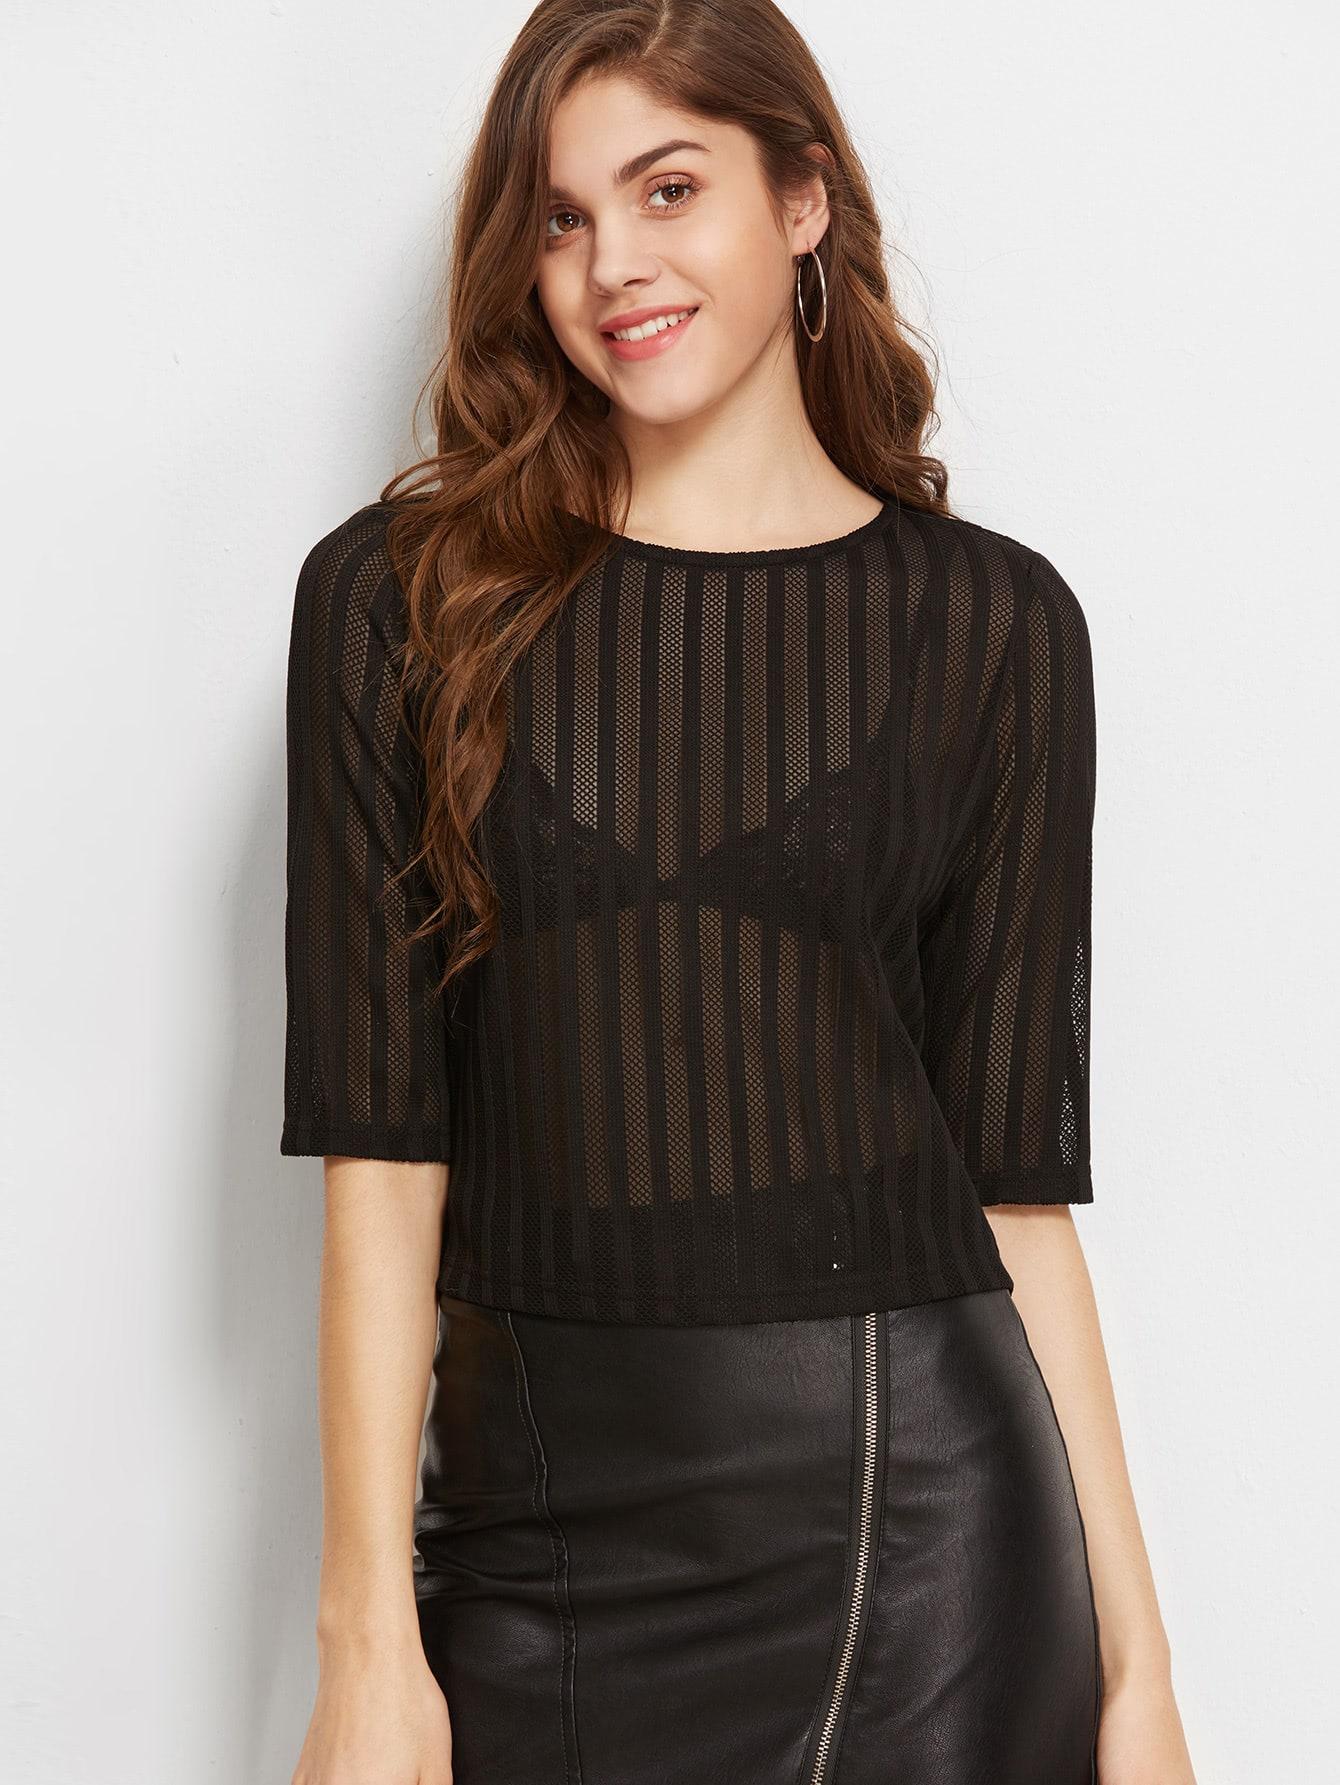 Half Sleeve Sheer Striped Mesh Top blouse161220702